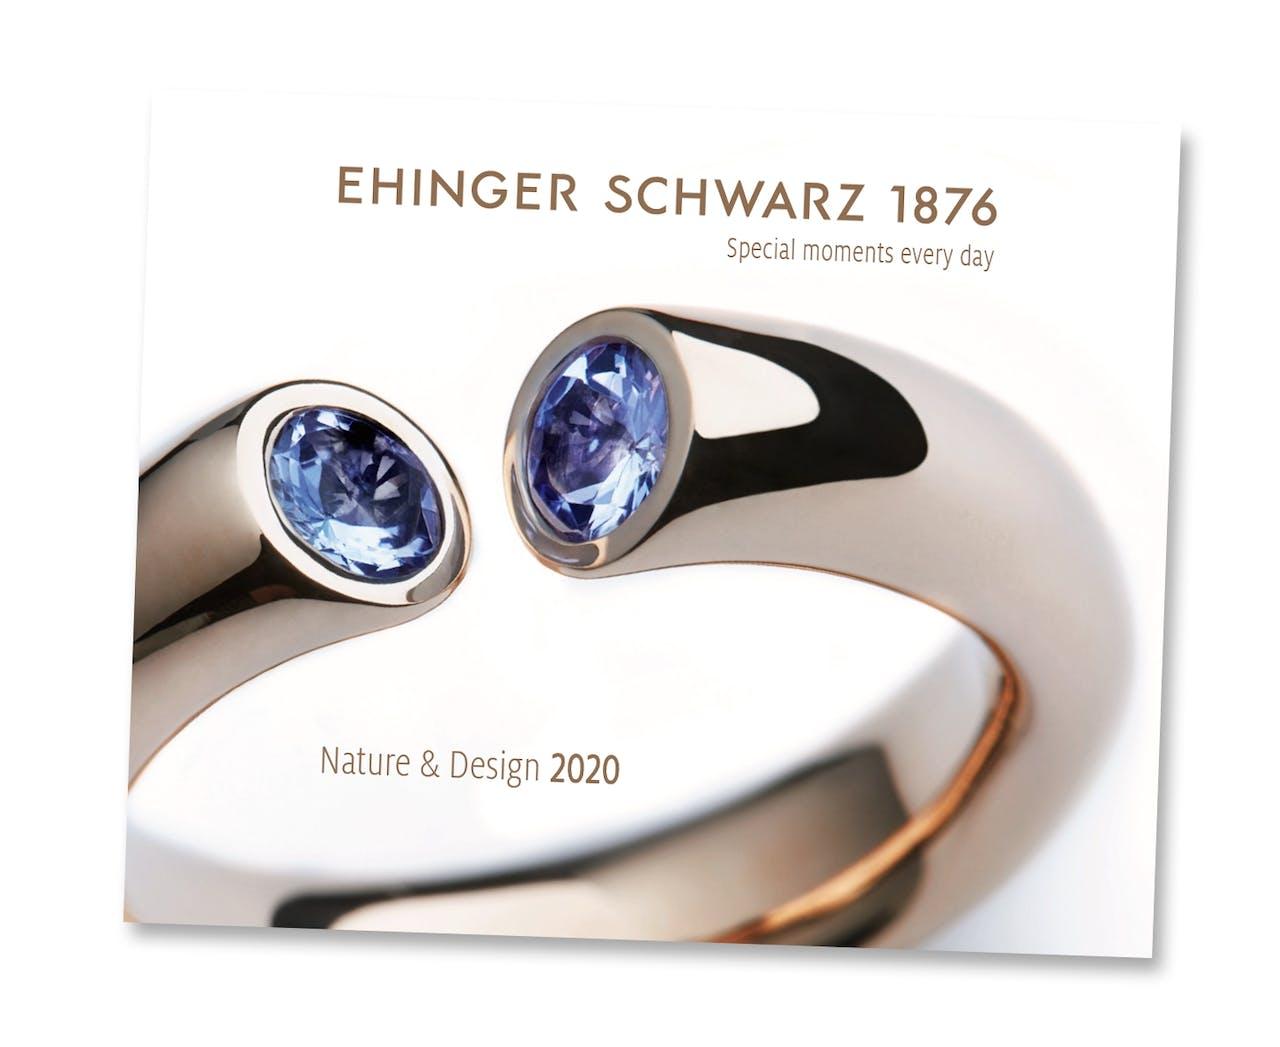 Schmuck EHINGER SCHWARZ 1876 | Juwelier Schmuckmanufaktur